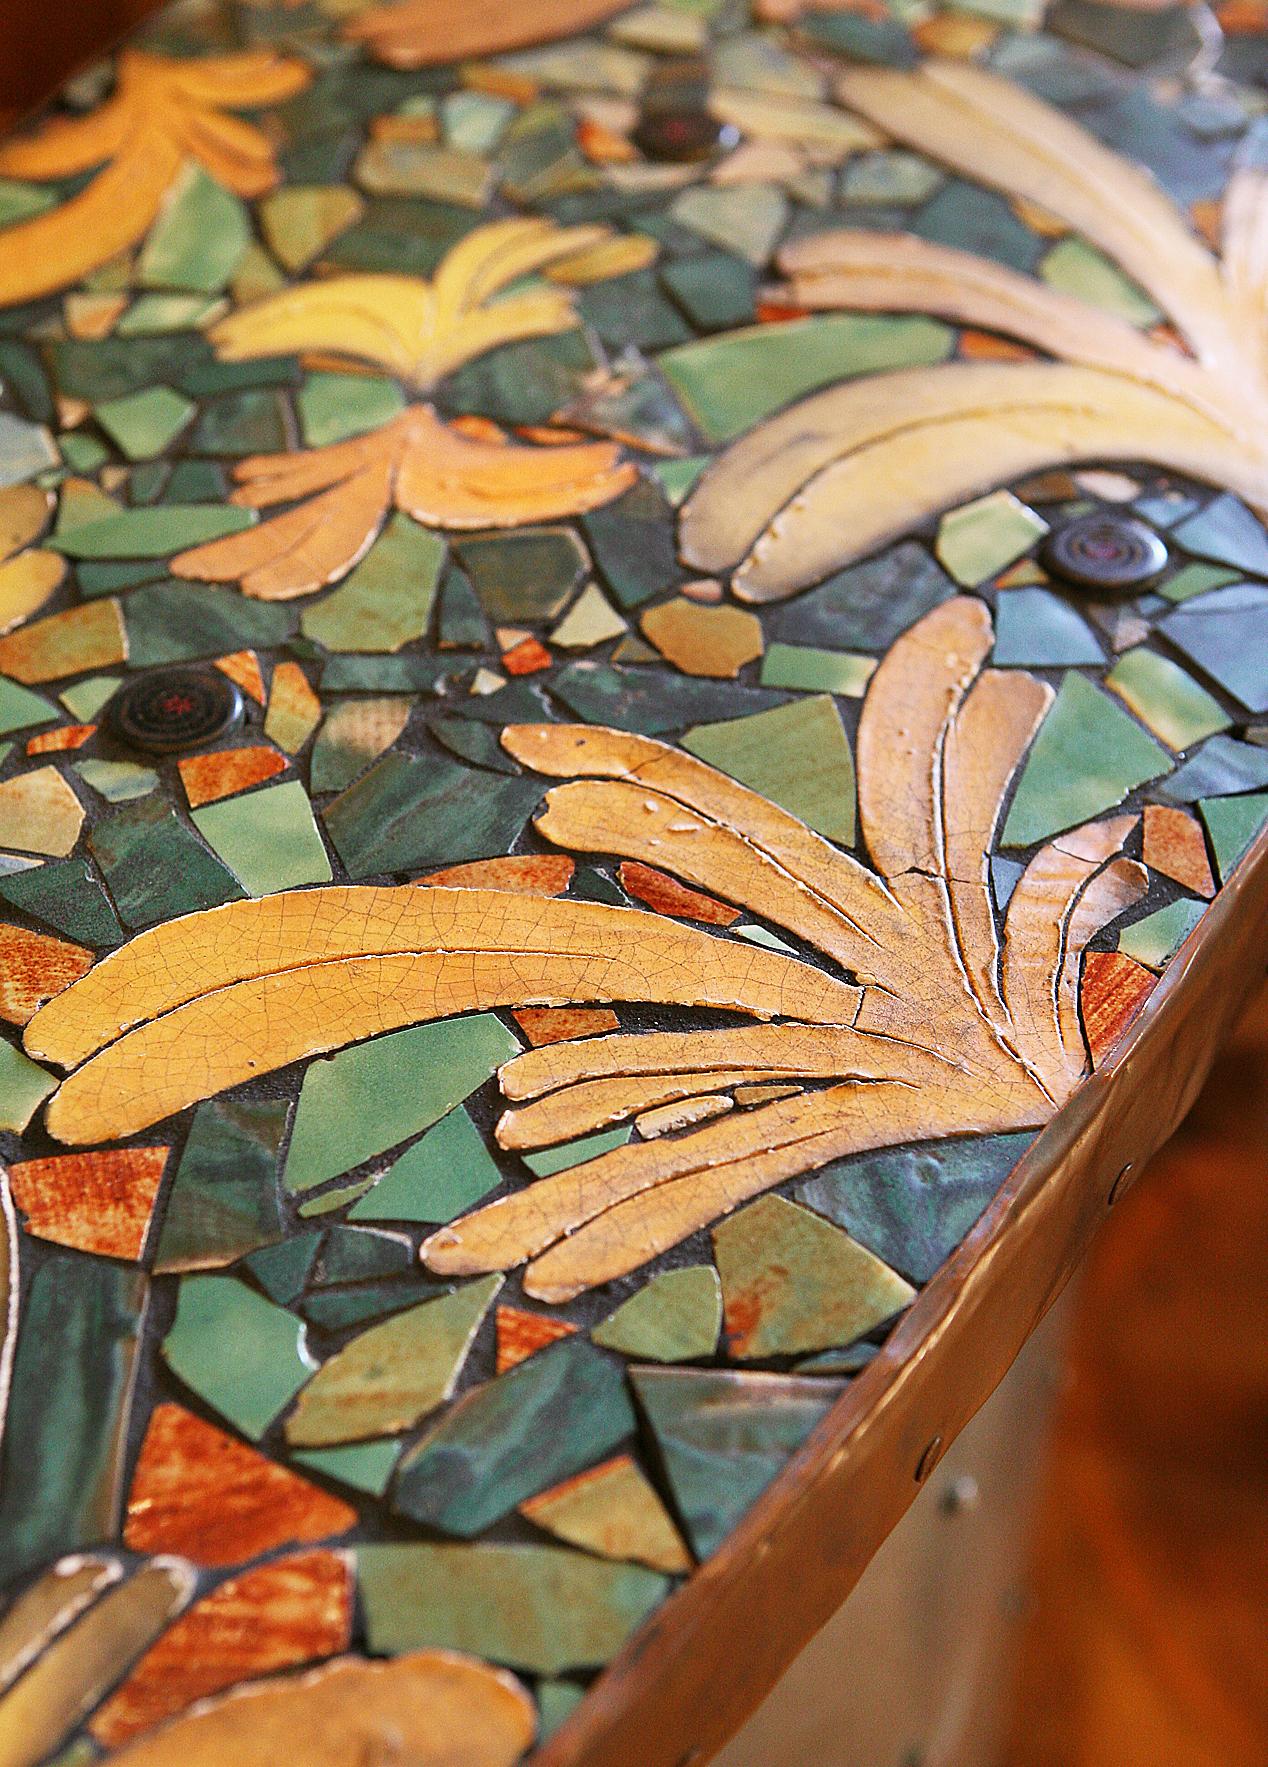 Mosaic counters.